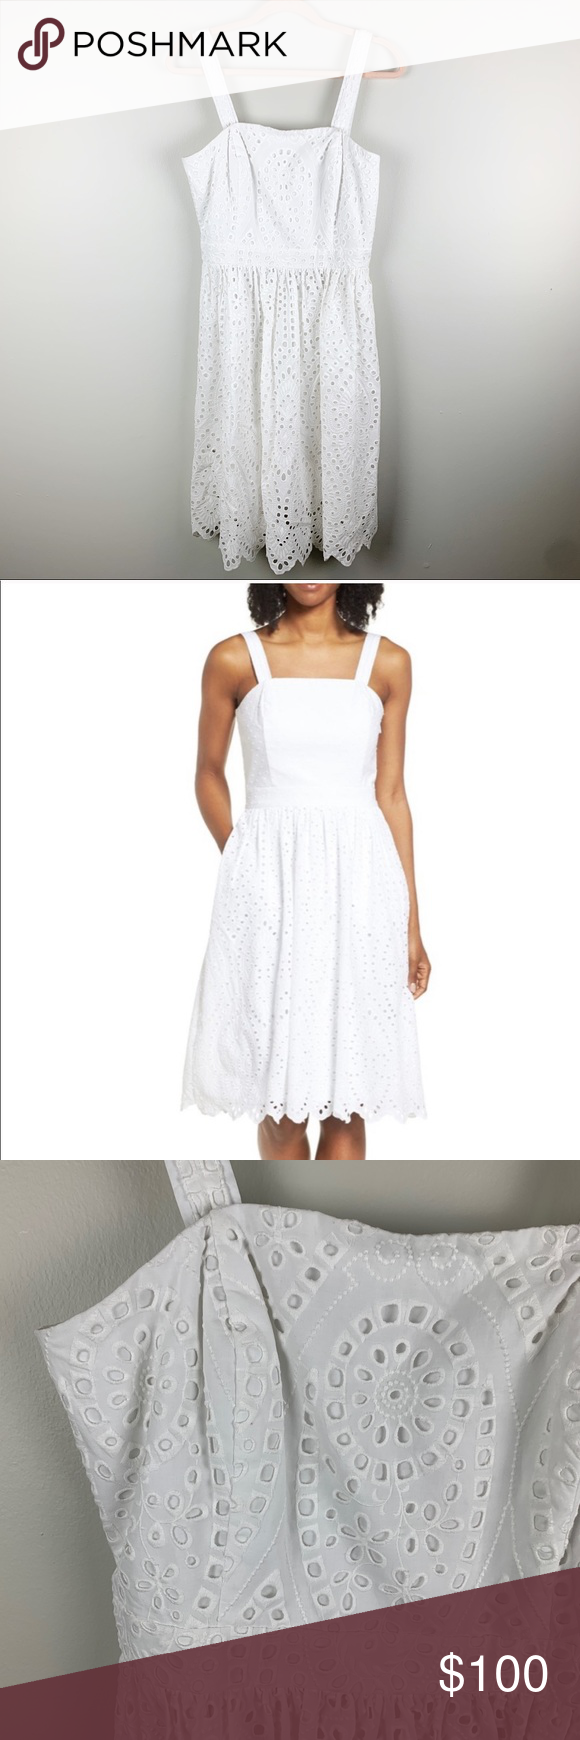 Vineyard Vines Convertible Eyelet Midi Dress White Vineyard Vines New With Tags Convertible Eyelet Midi White Midi Dress Party Dress Classy Casual Party Outfit [ 1740 x 580 Pixel ]